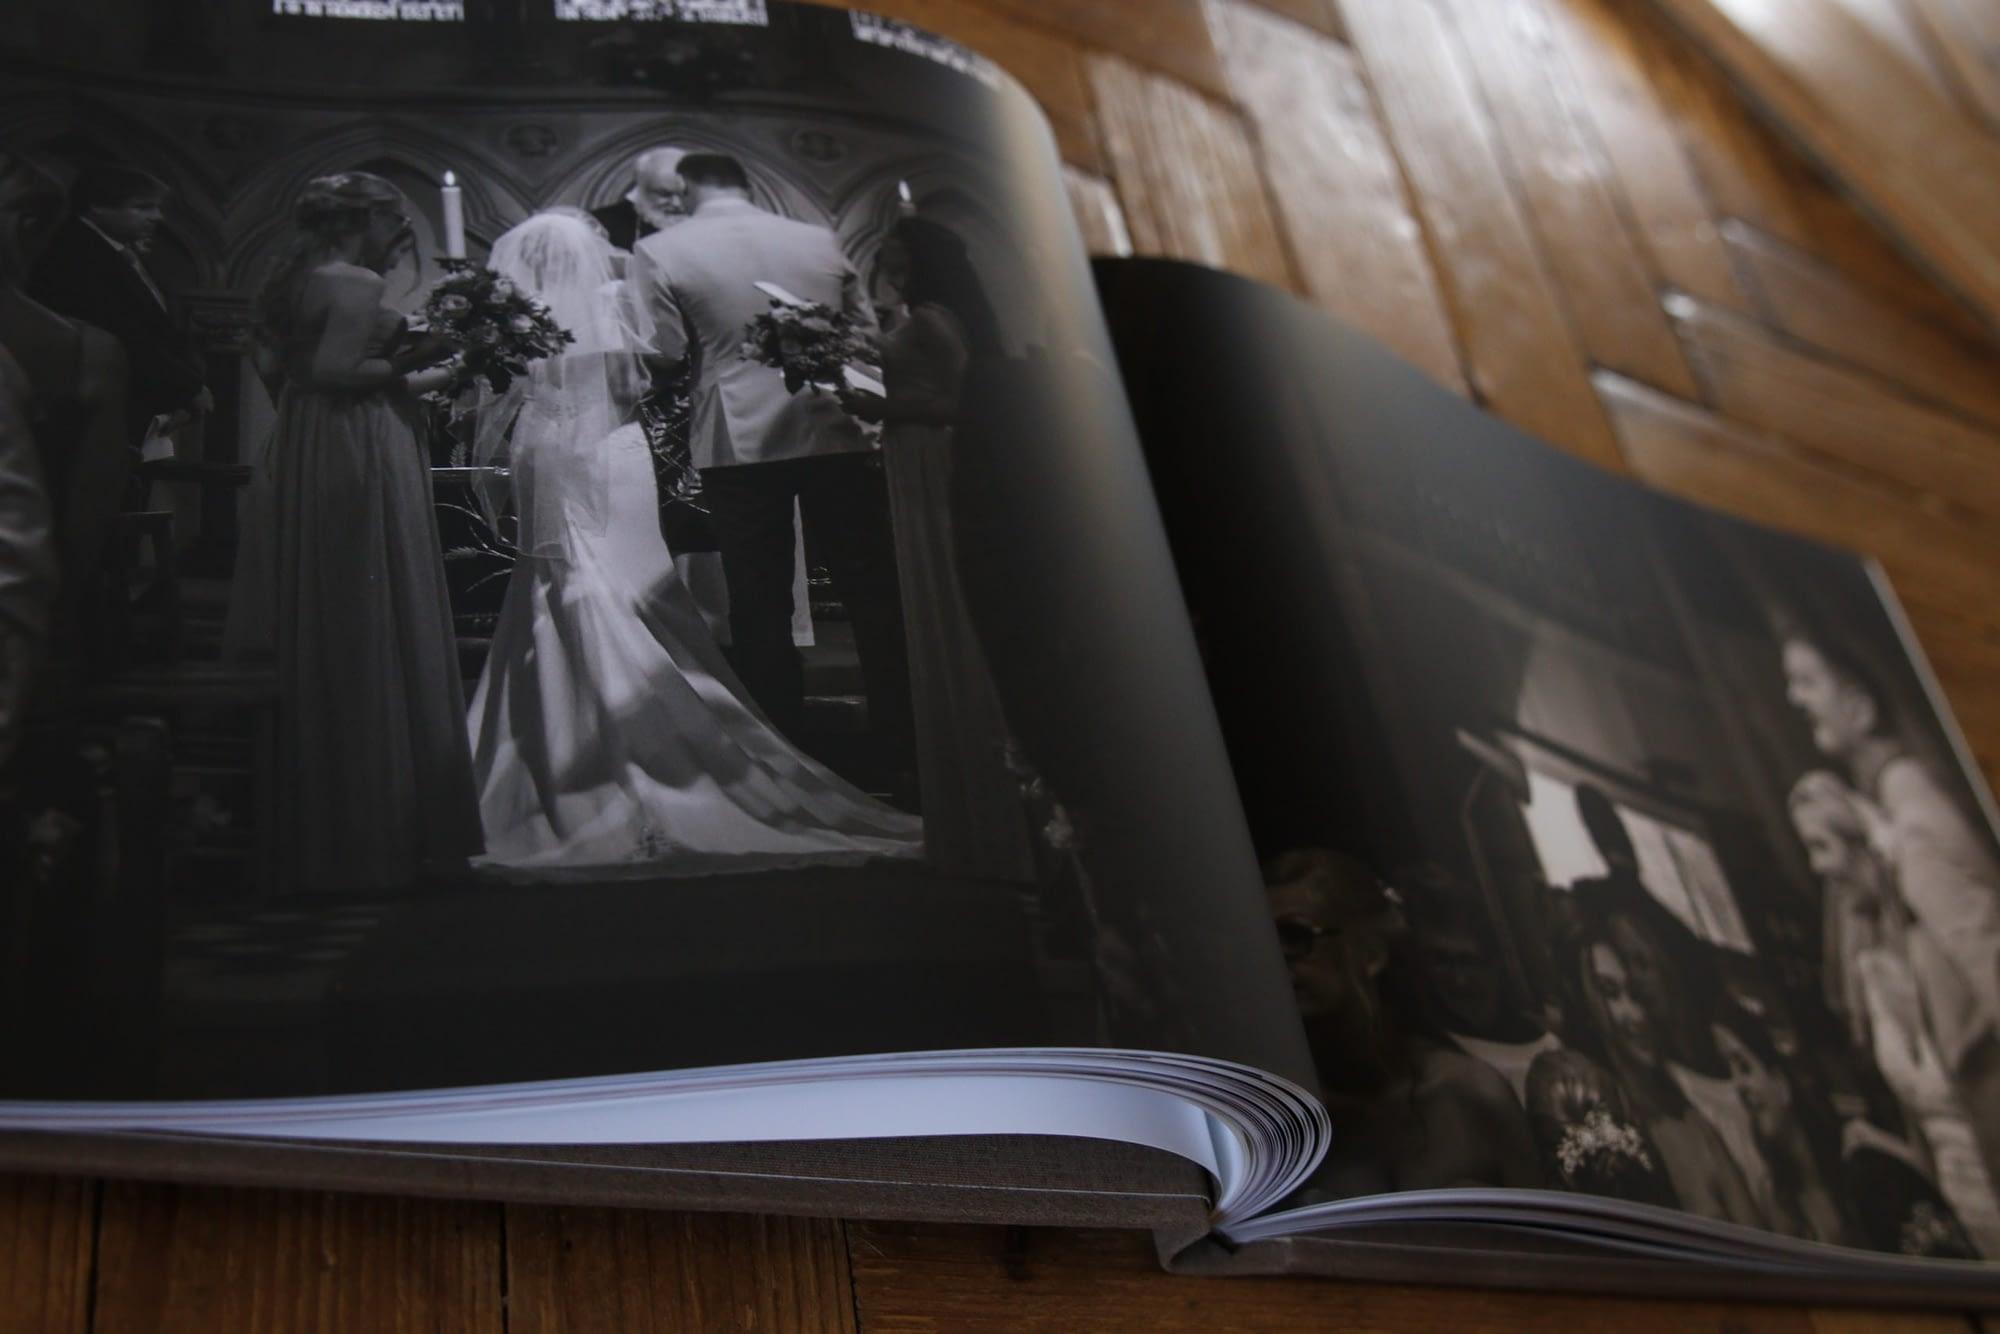 open book showing wedding